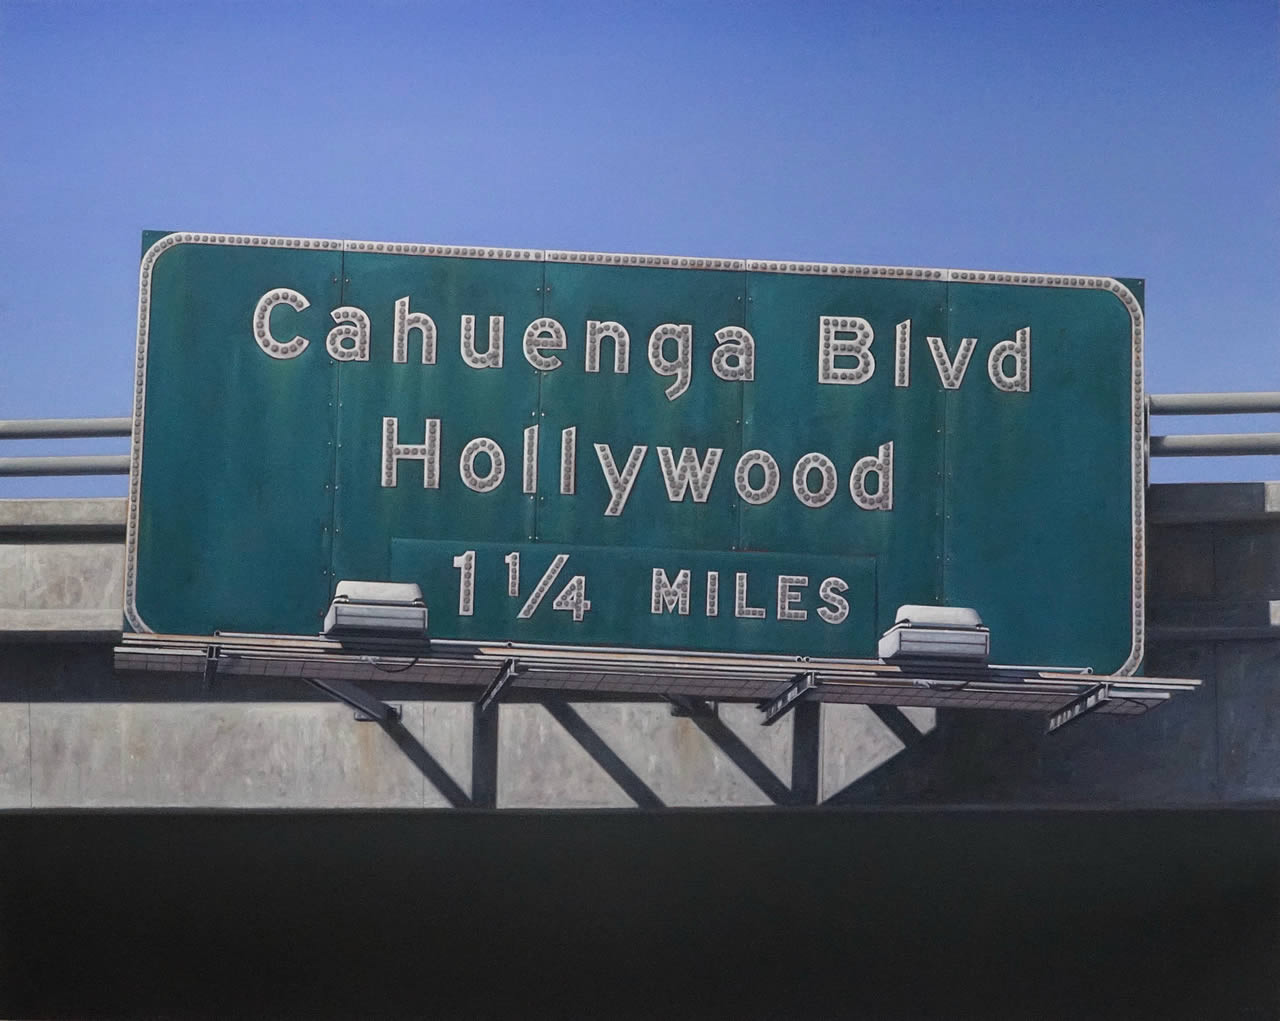 Cahuenga Blvd Hollywood